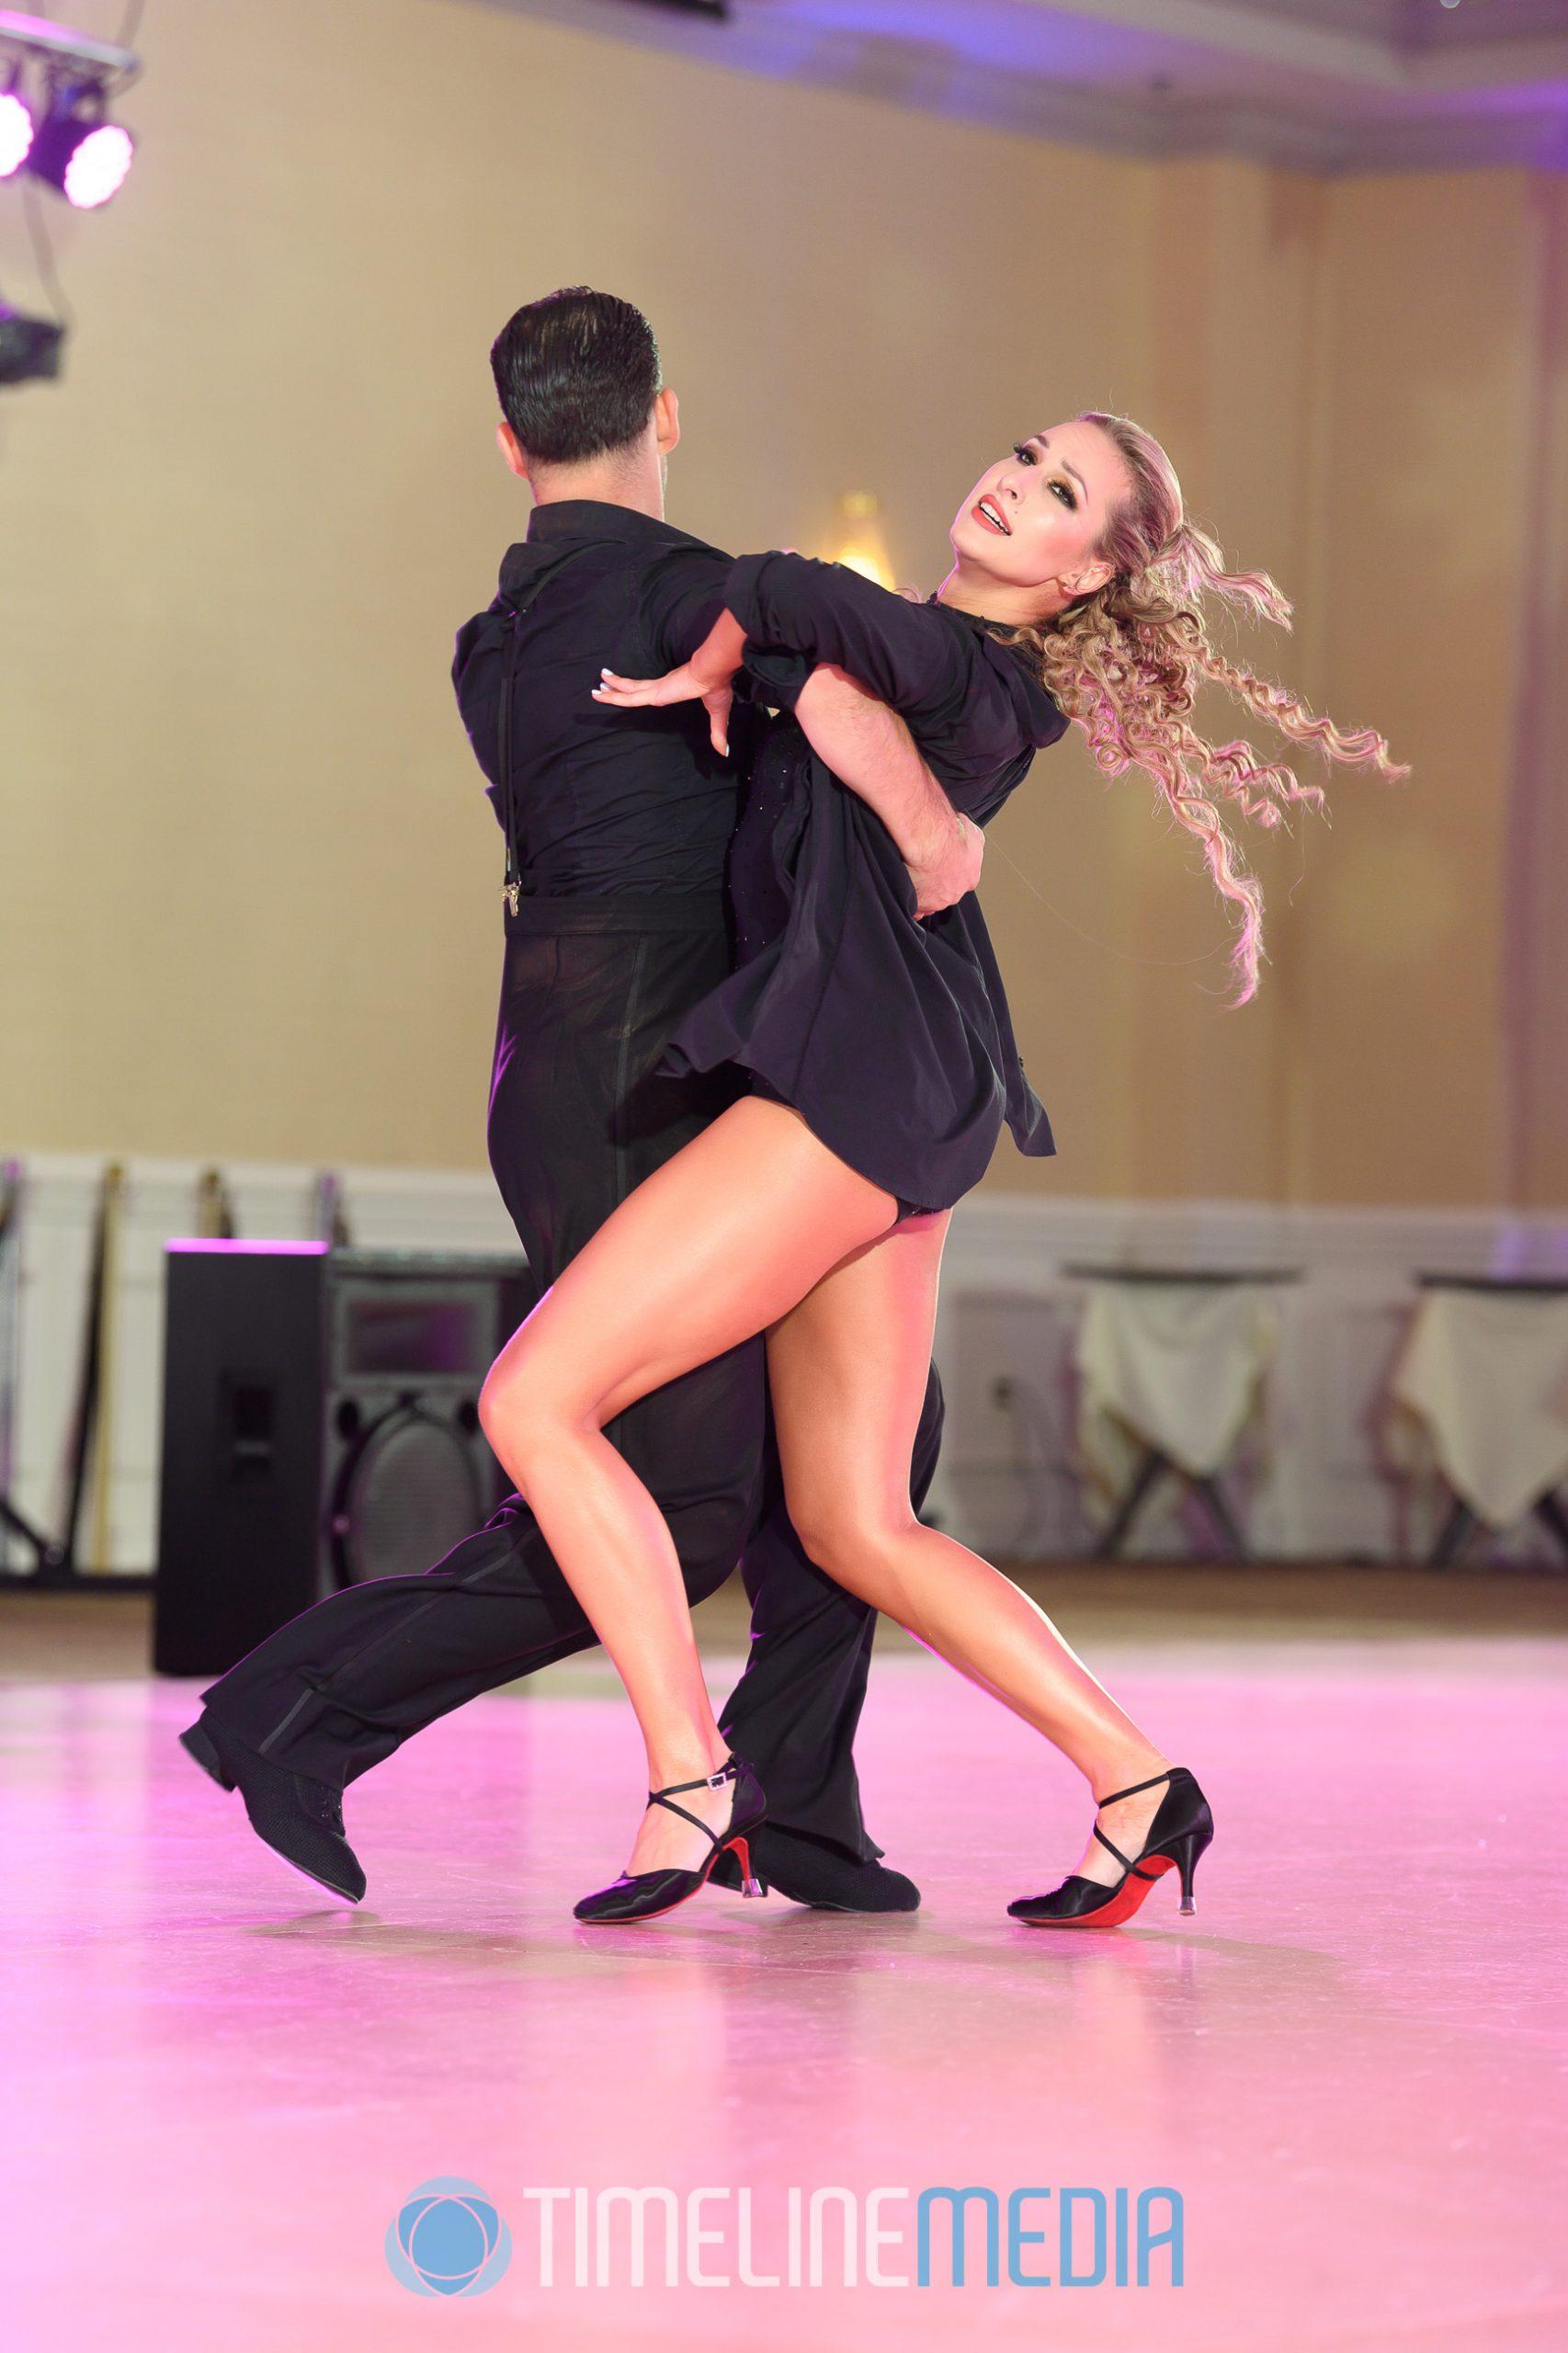 Max Sinitsa and Tatiana Seliverstova performing a professional dance show ©TimeLine Media